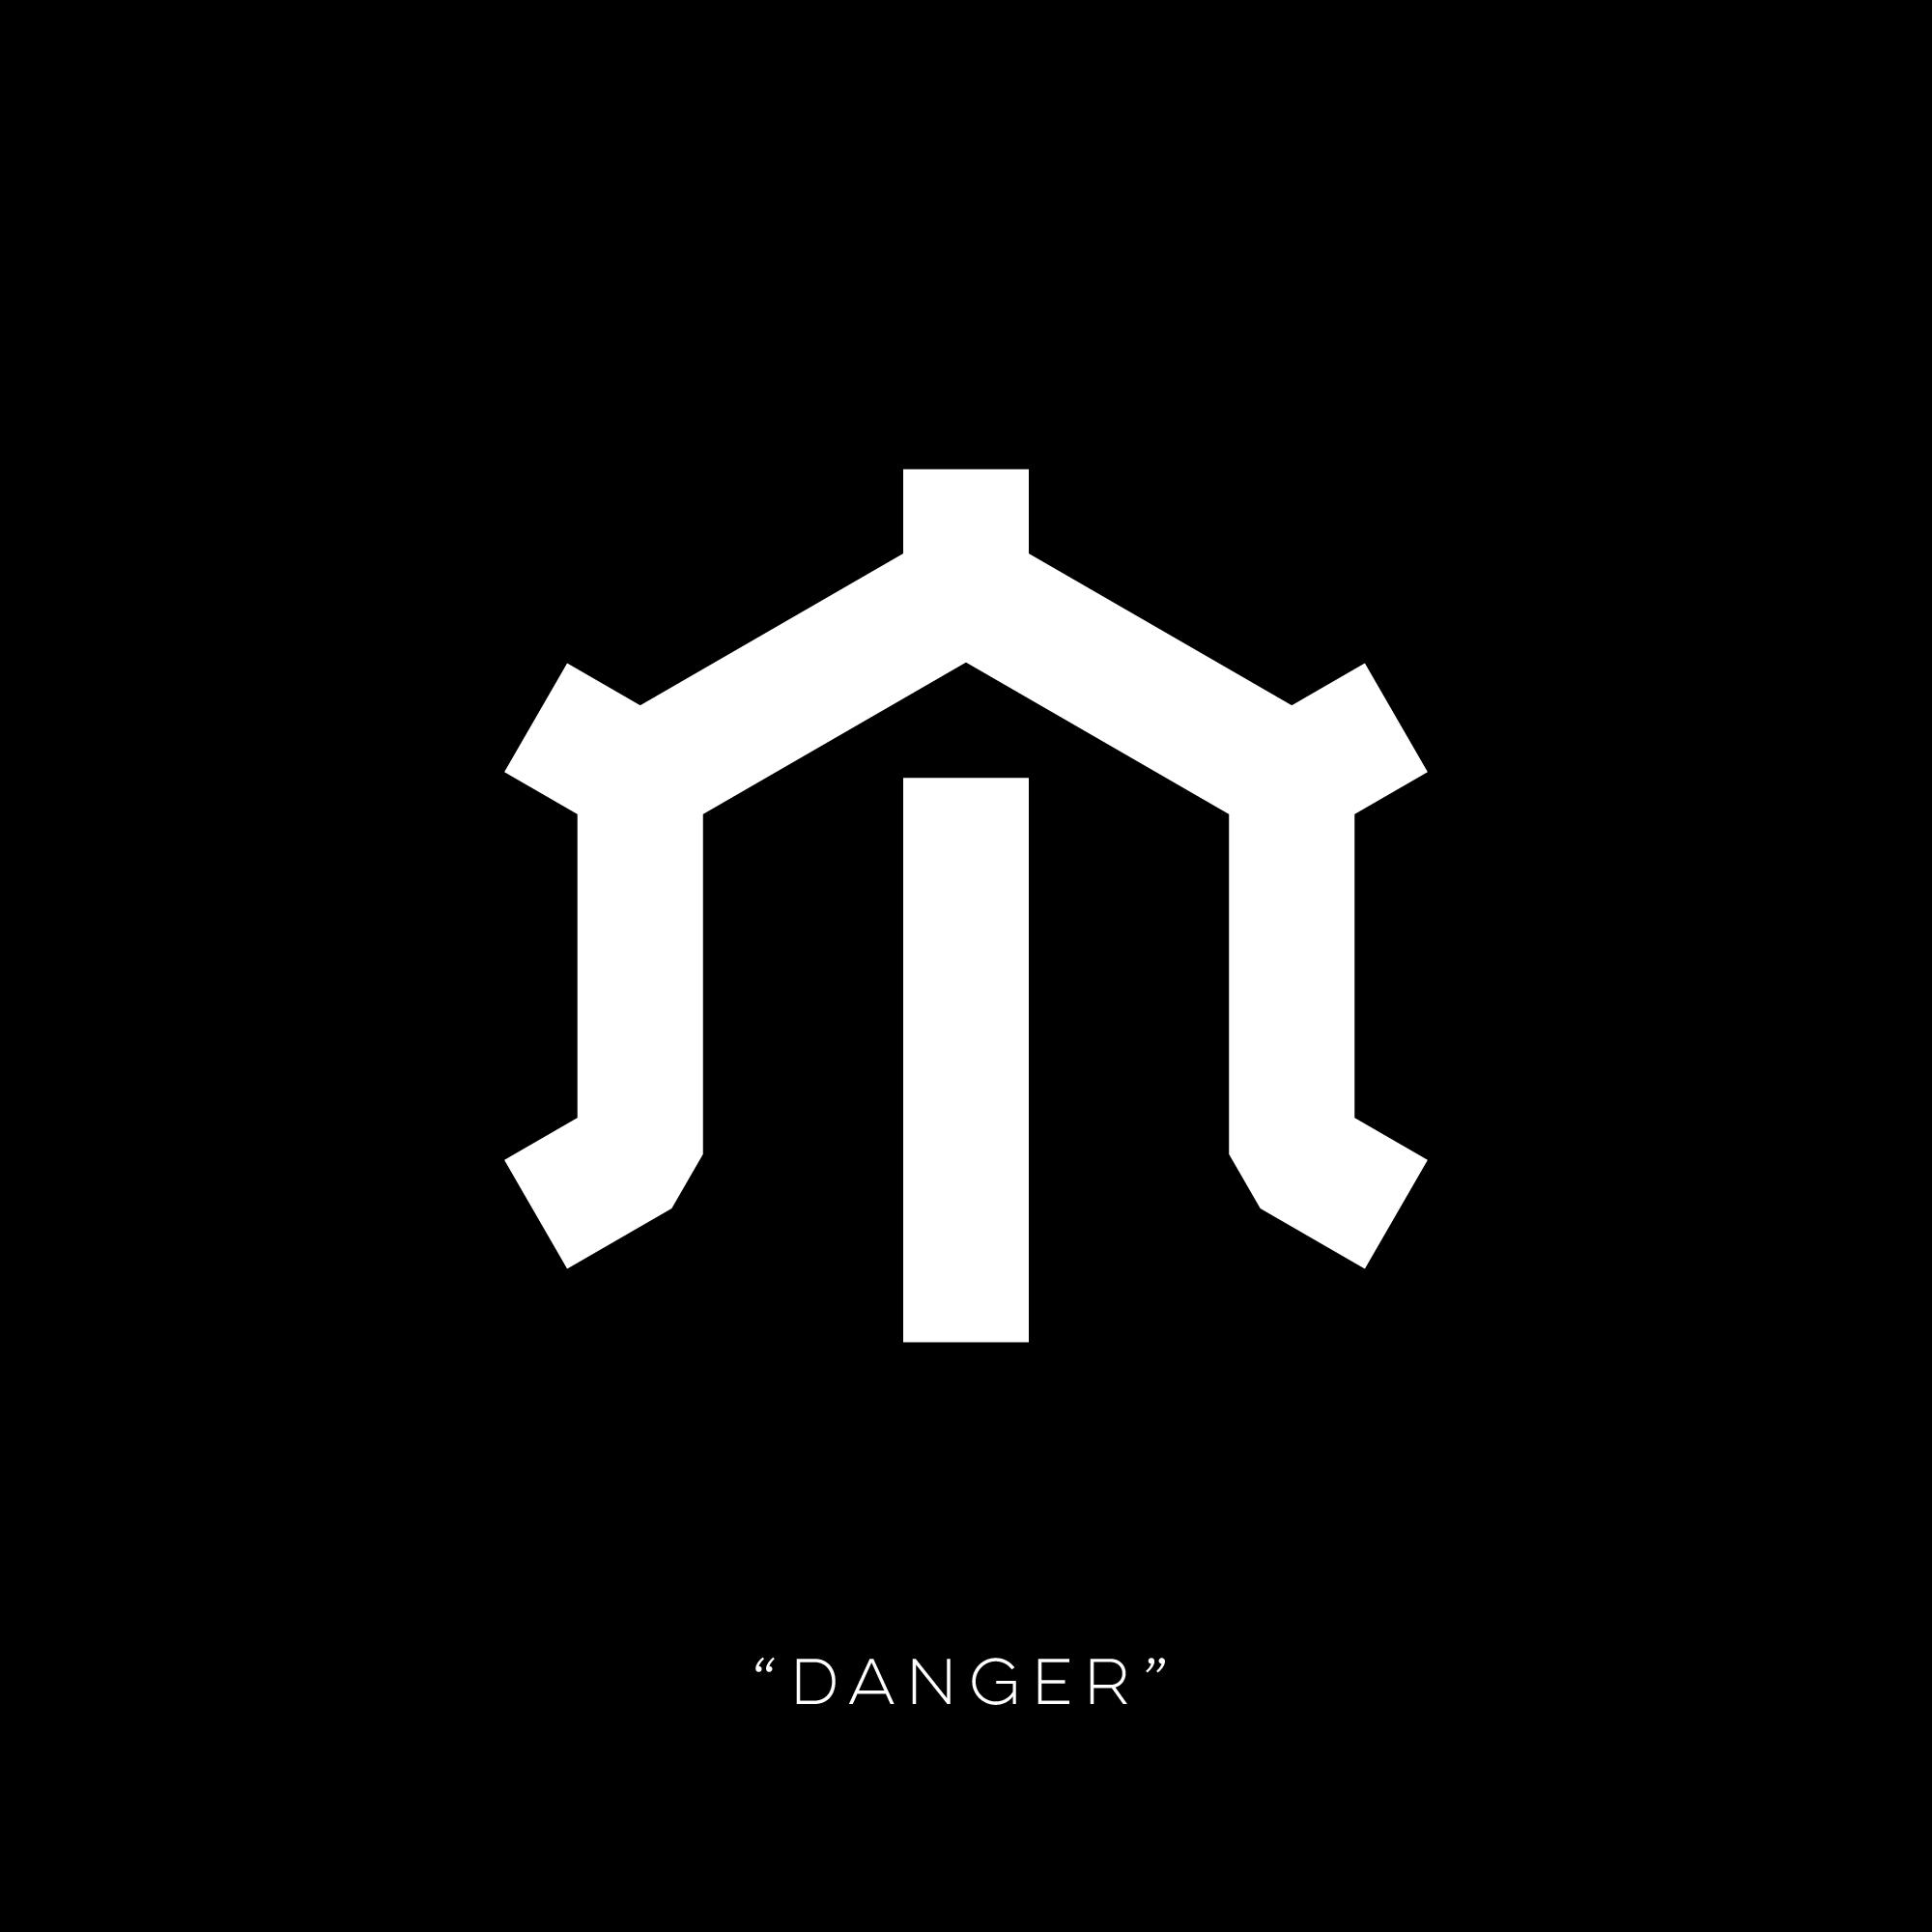 14 DANGER.png